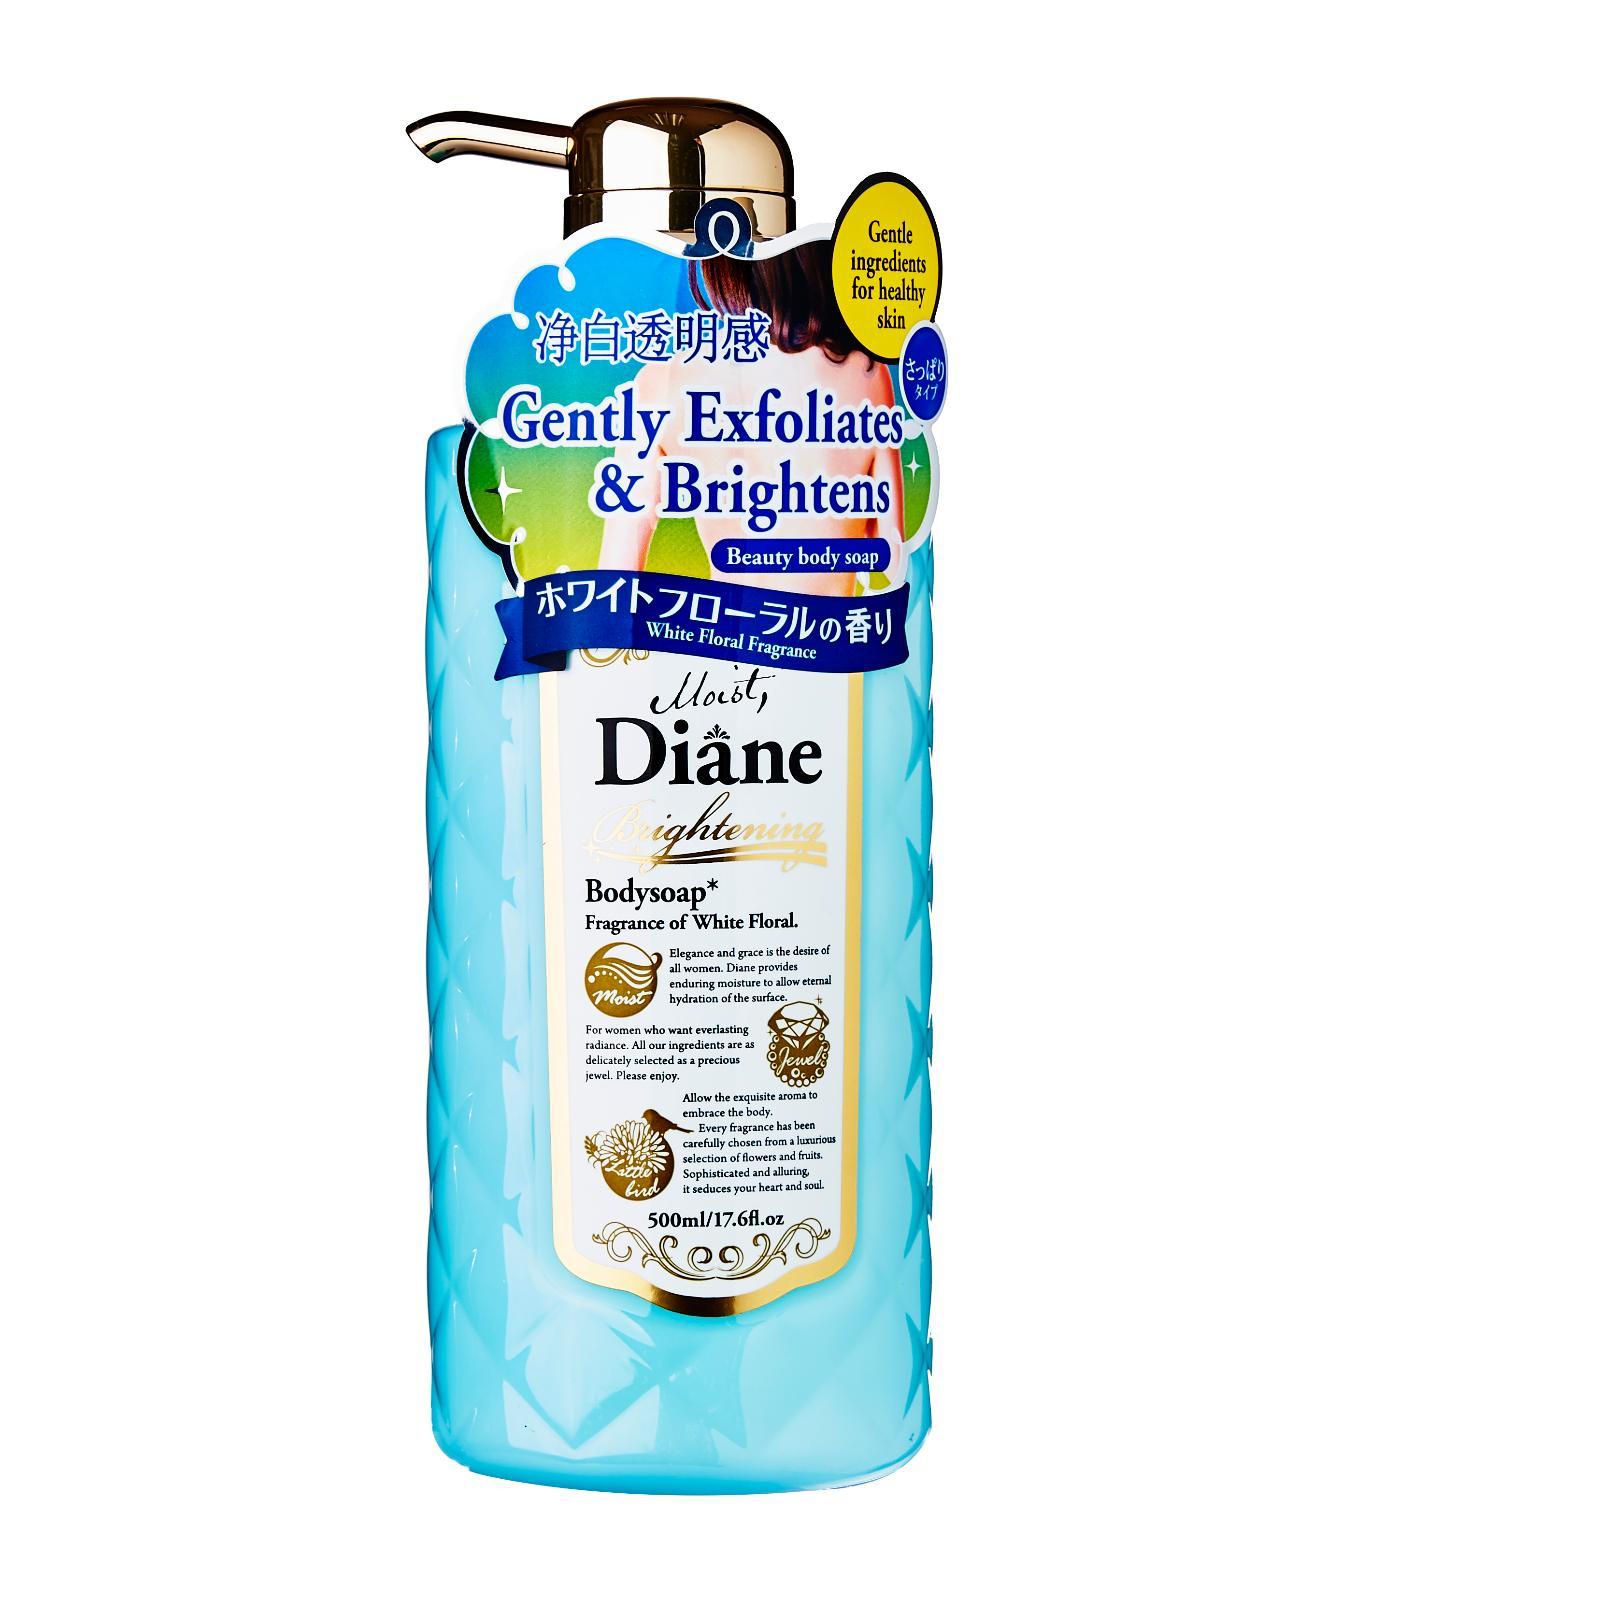 Moist Diane Brightening Body Soap White Floral